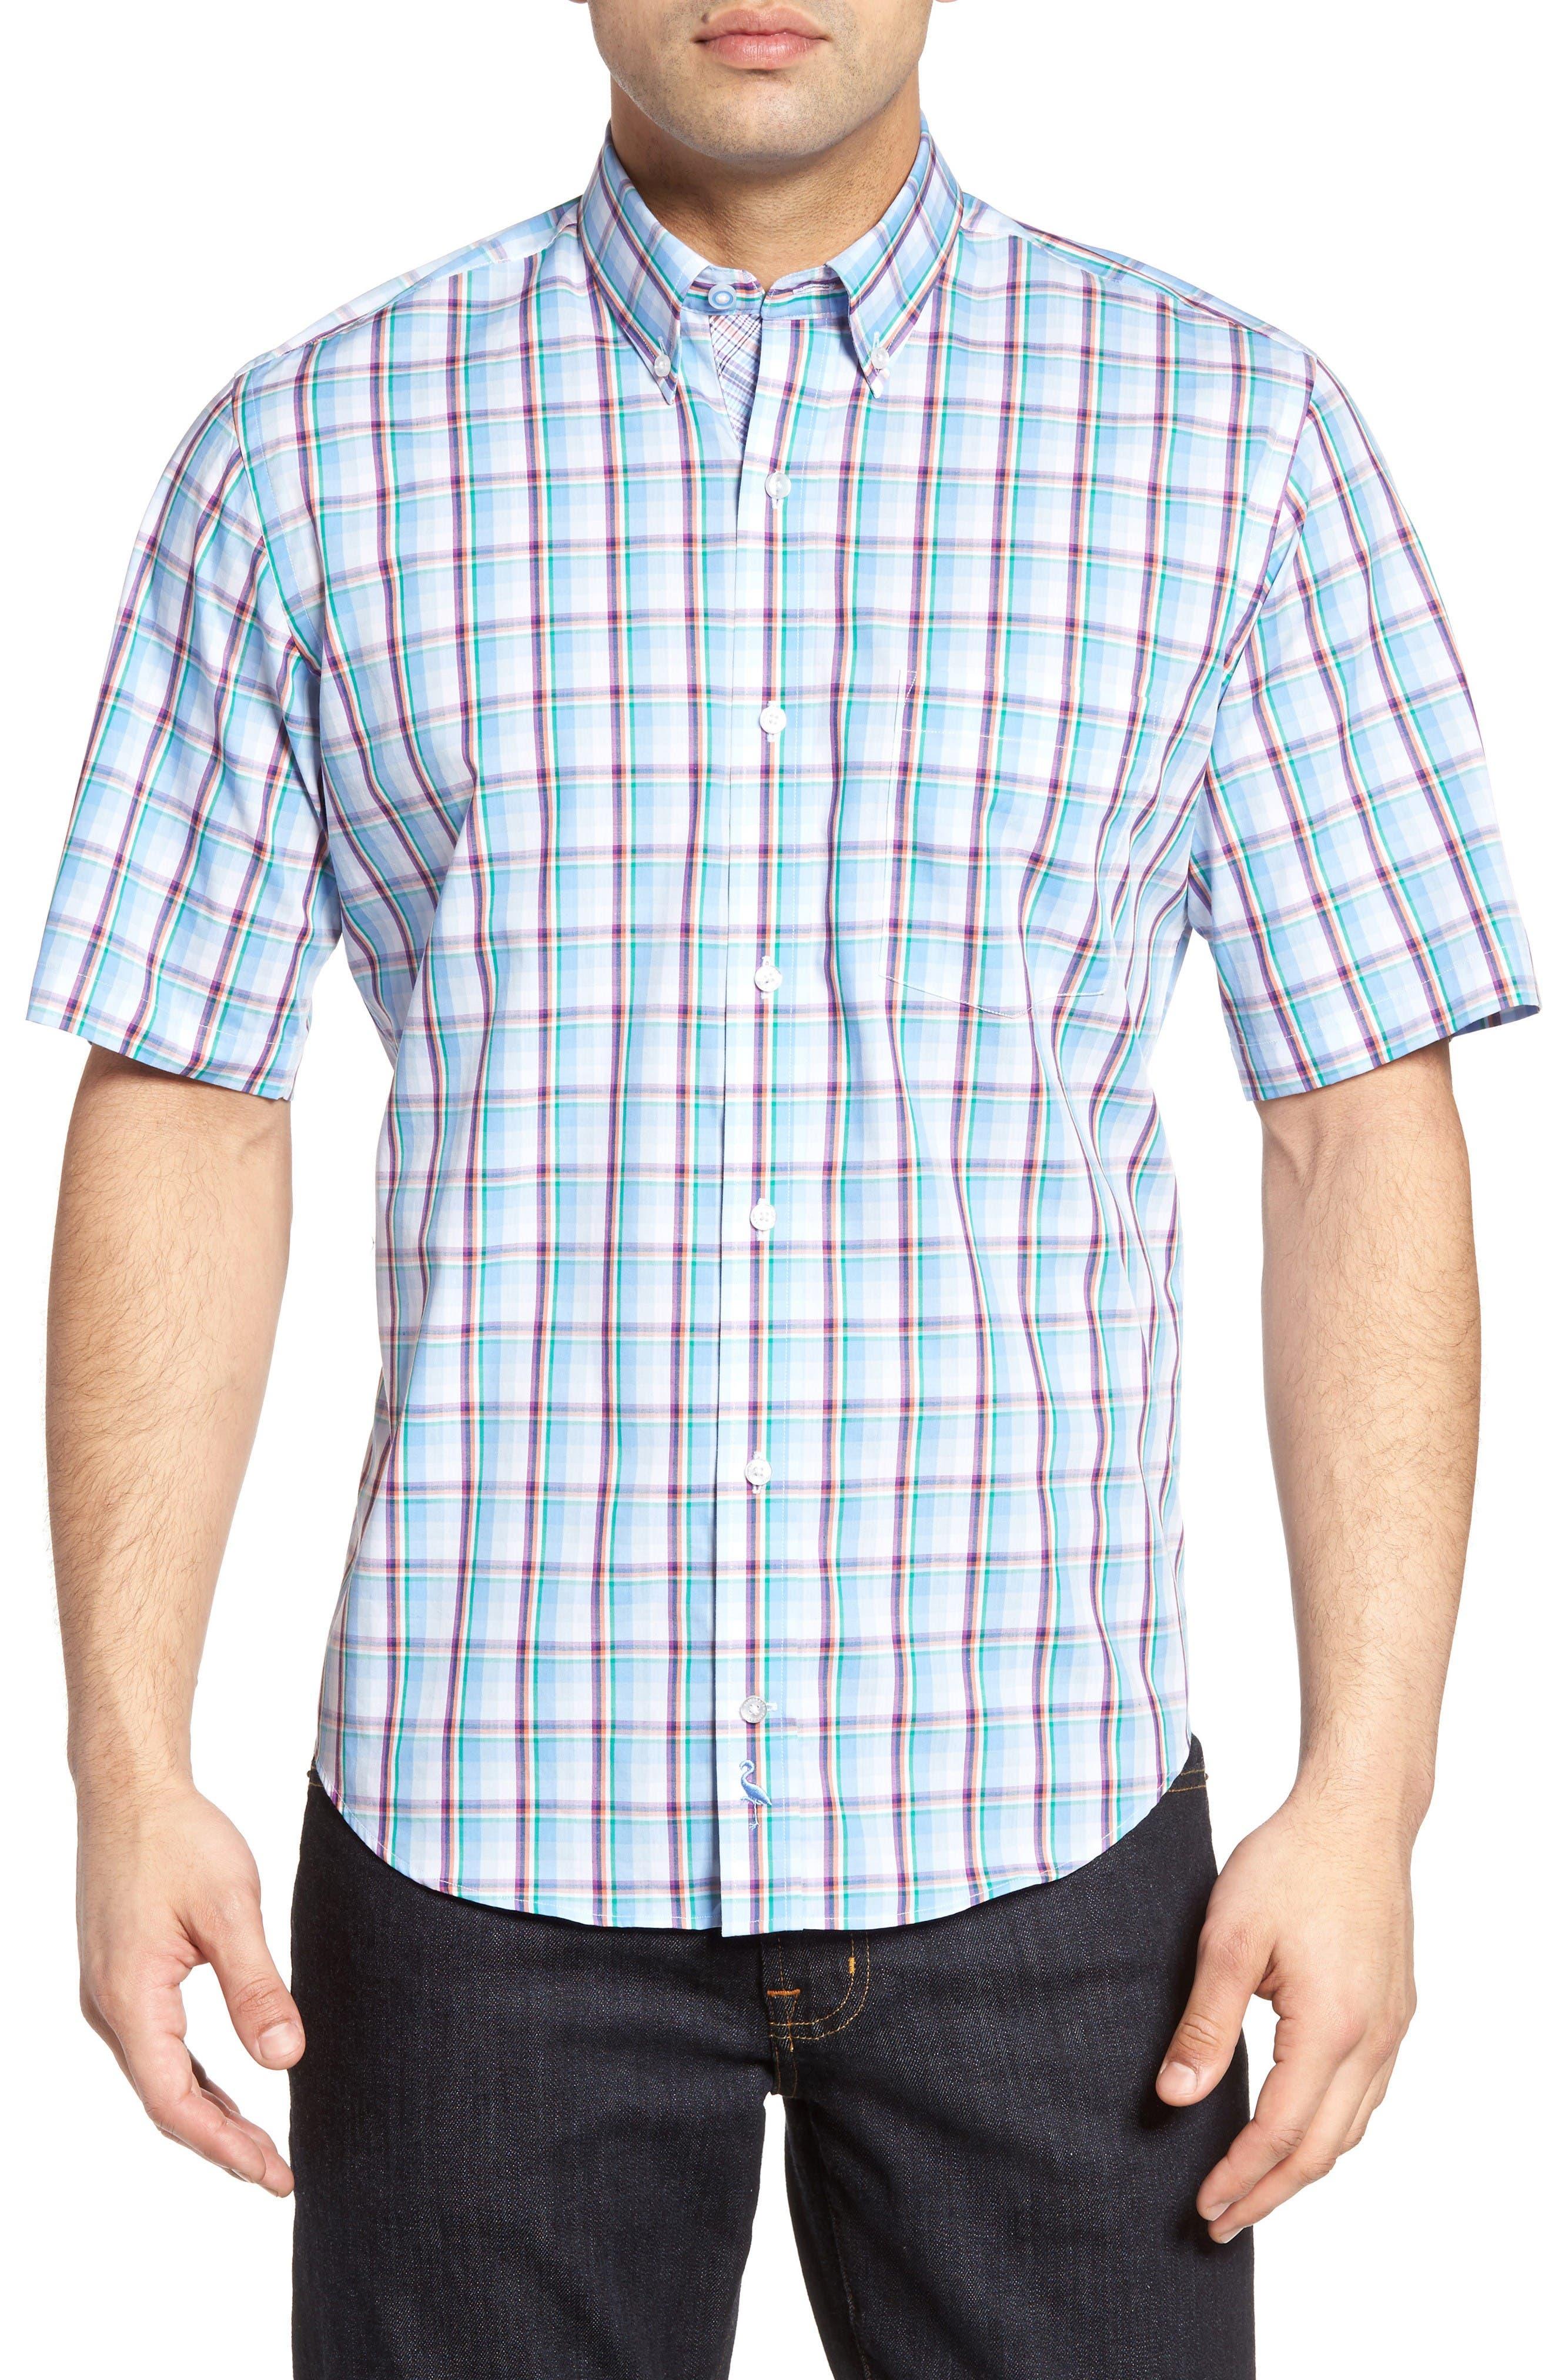 Main Image - TailorByrd Pinyon Plaid Sport Shirt